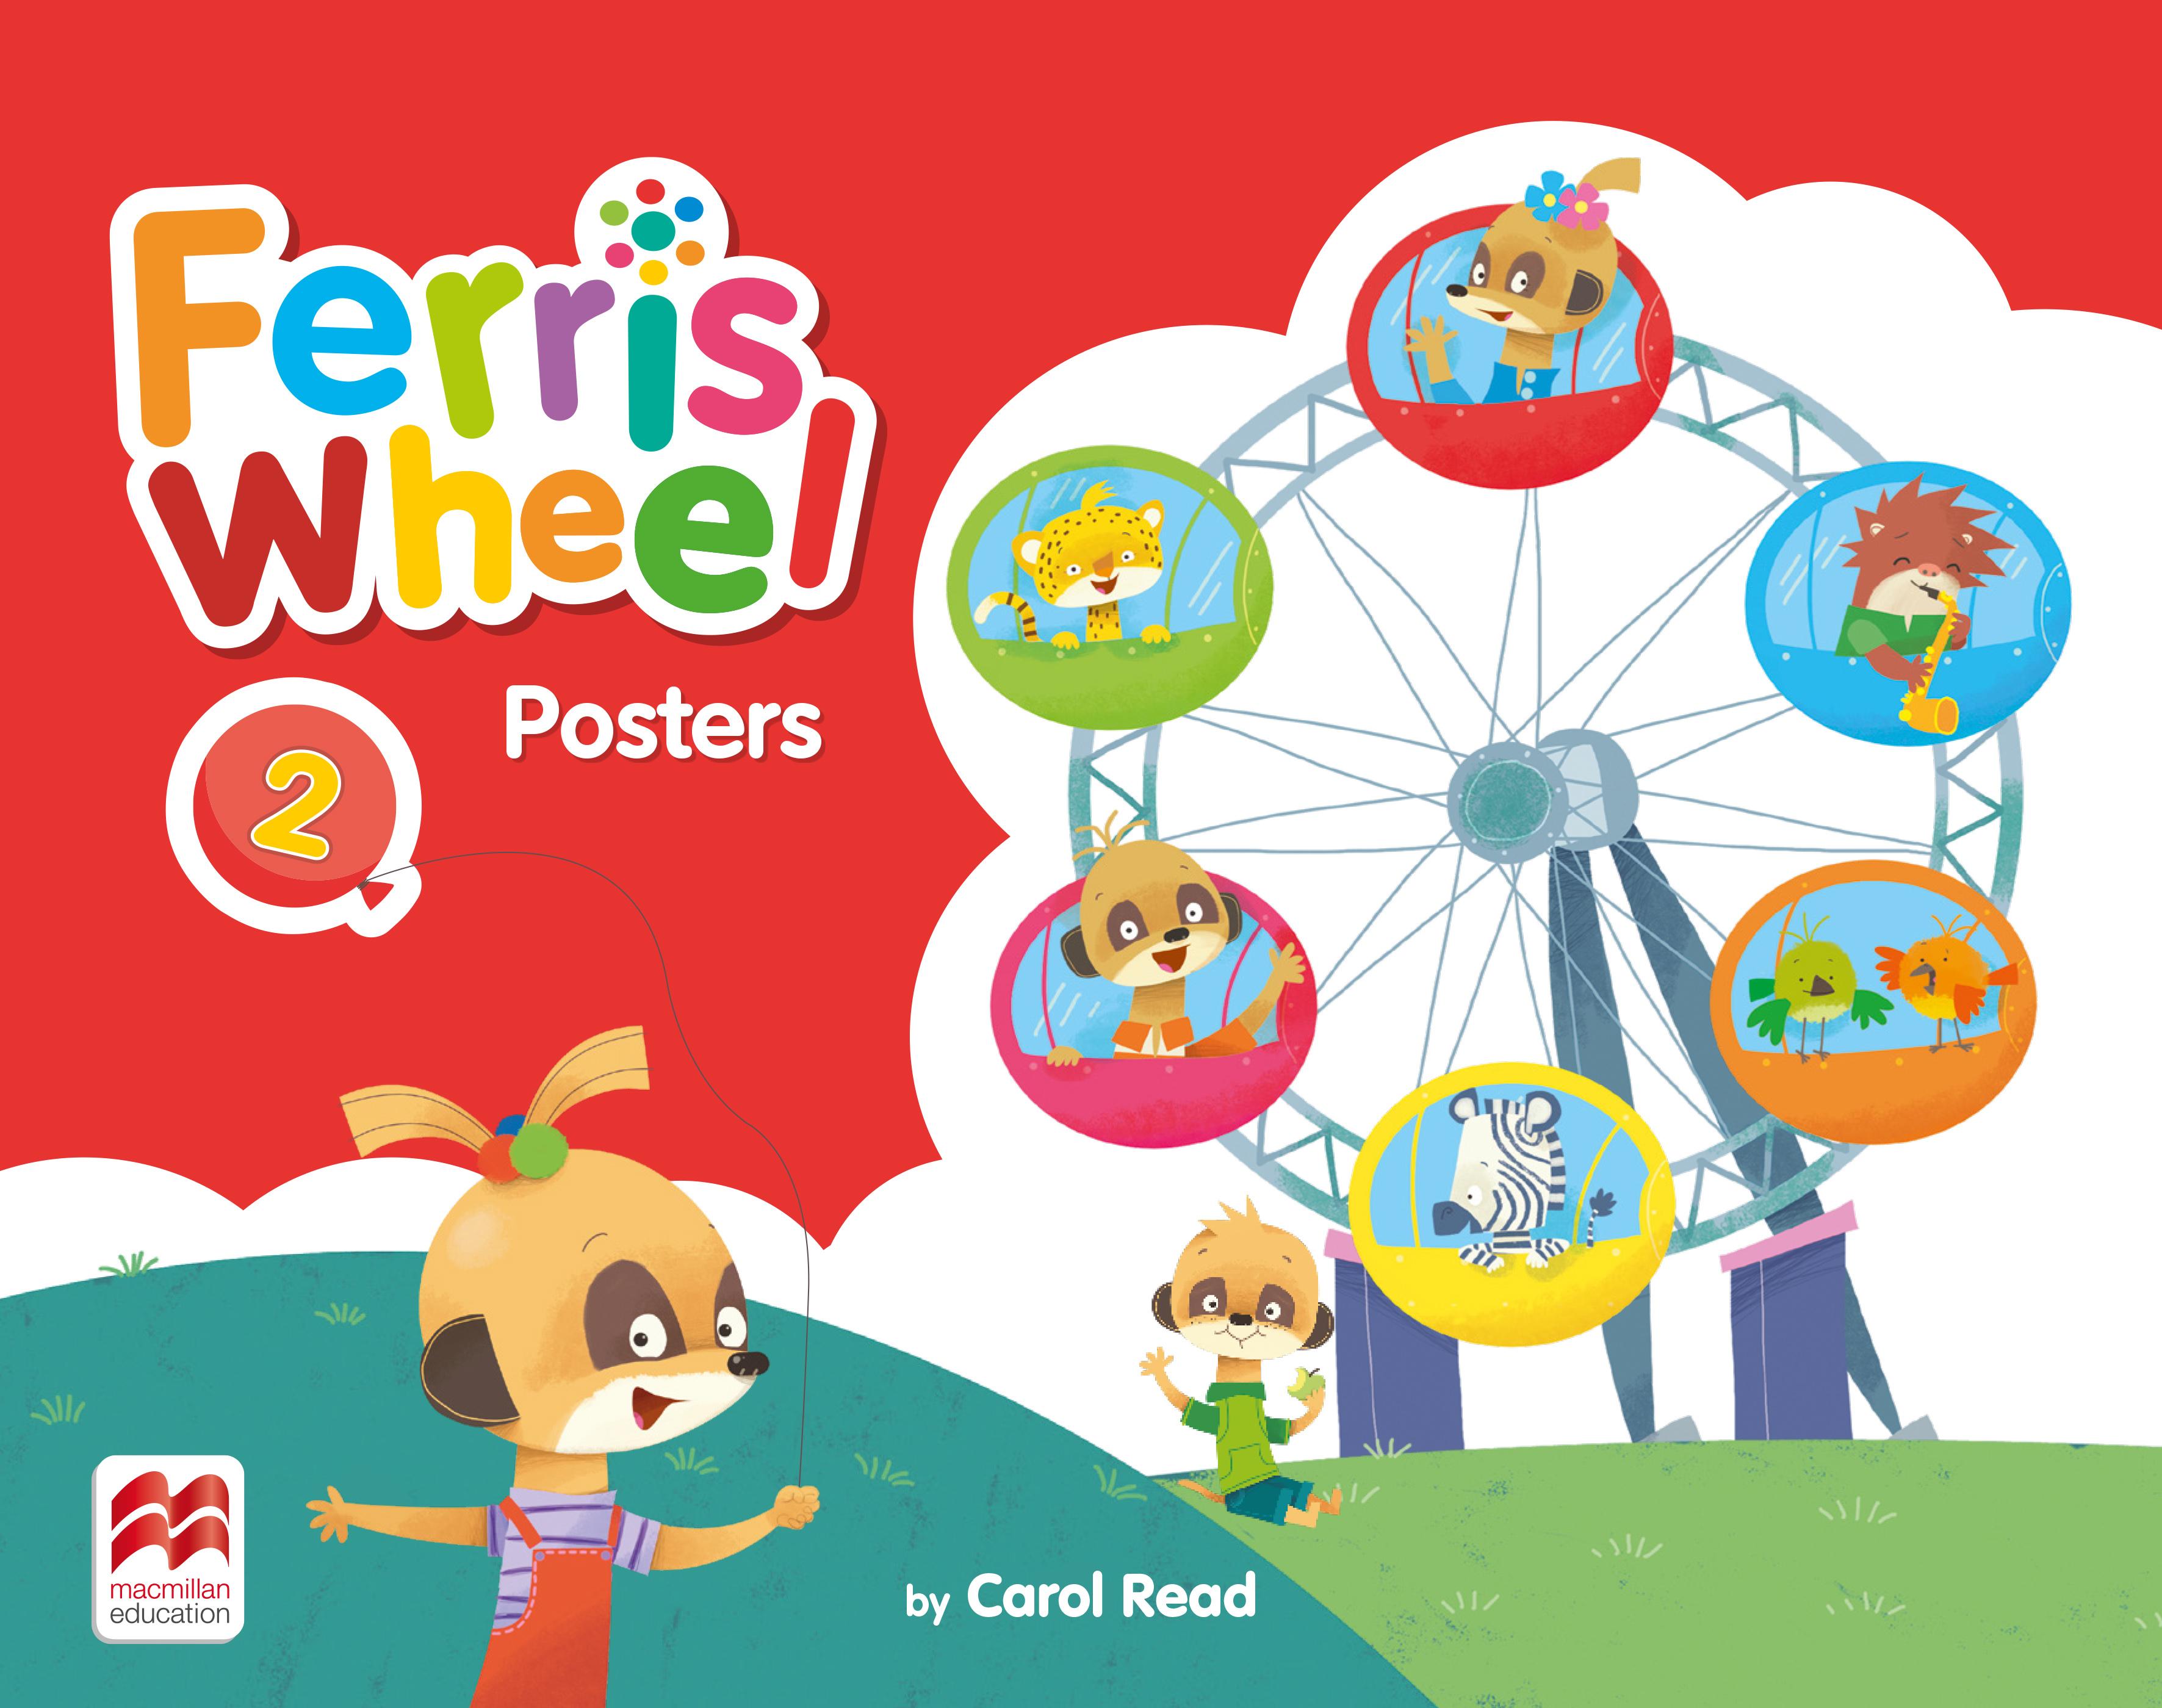 Ferris Wheel Level 2 Posters